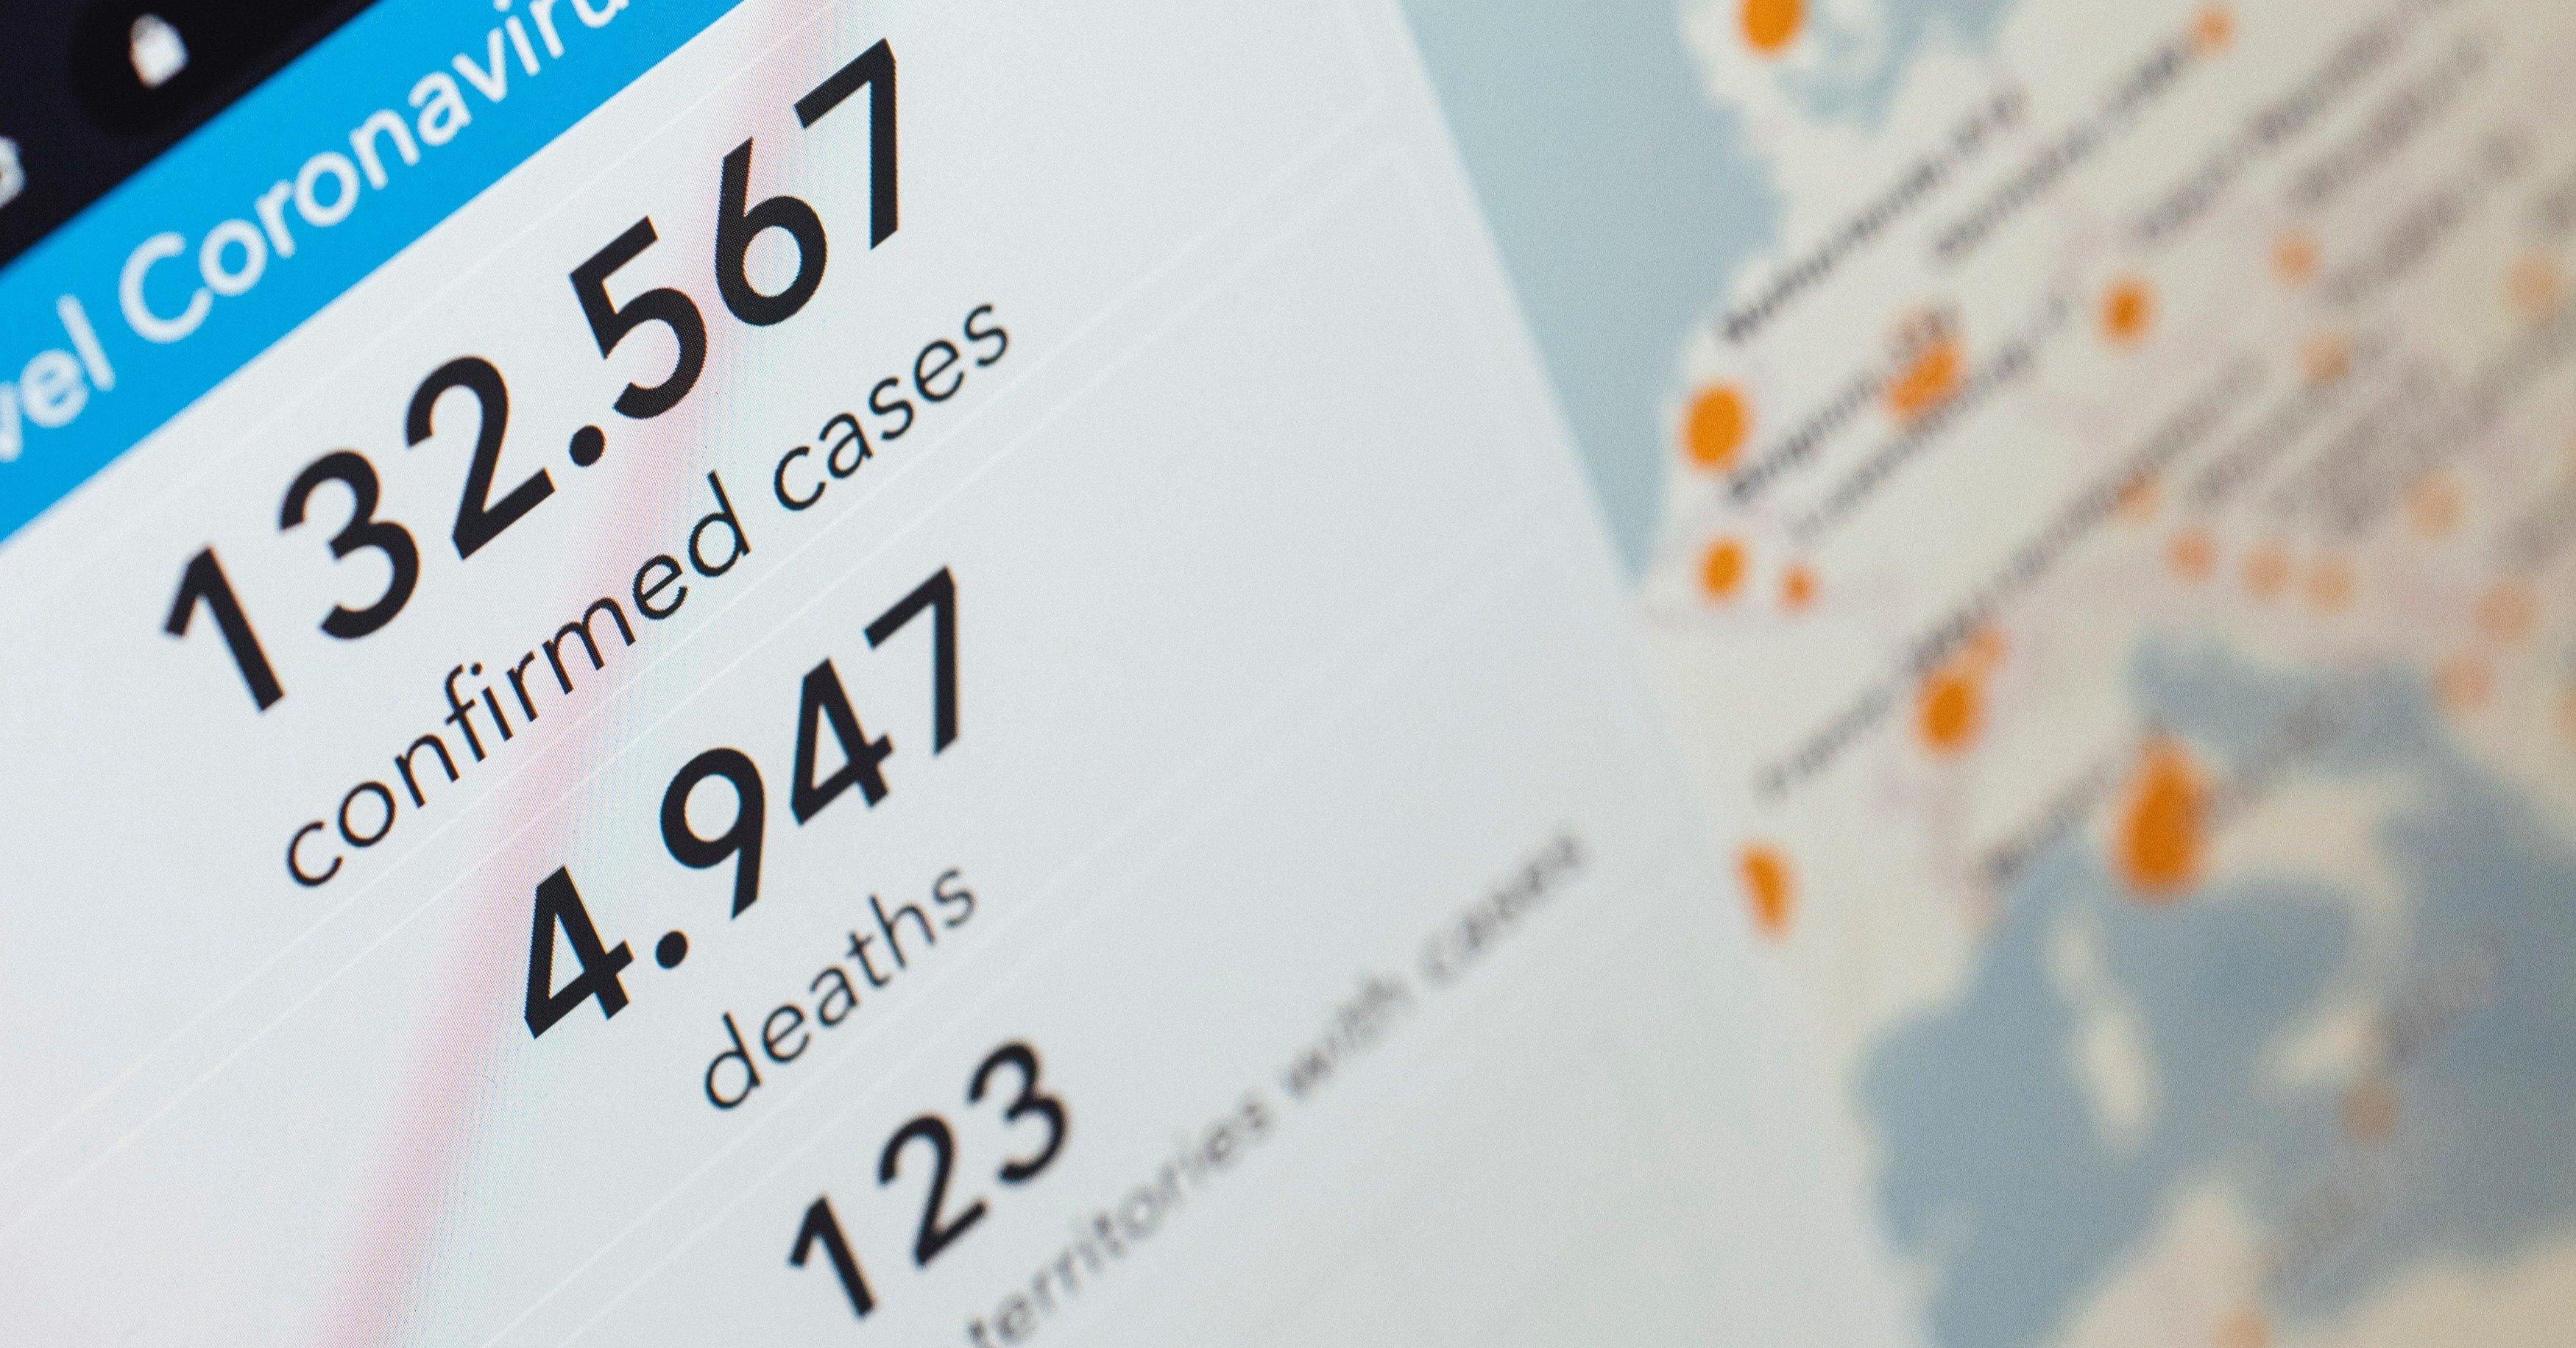 Healthjump's Data Management Capabilities Assist COVID-19 Registries & Research